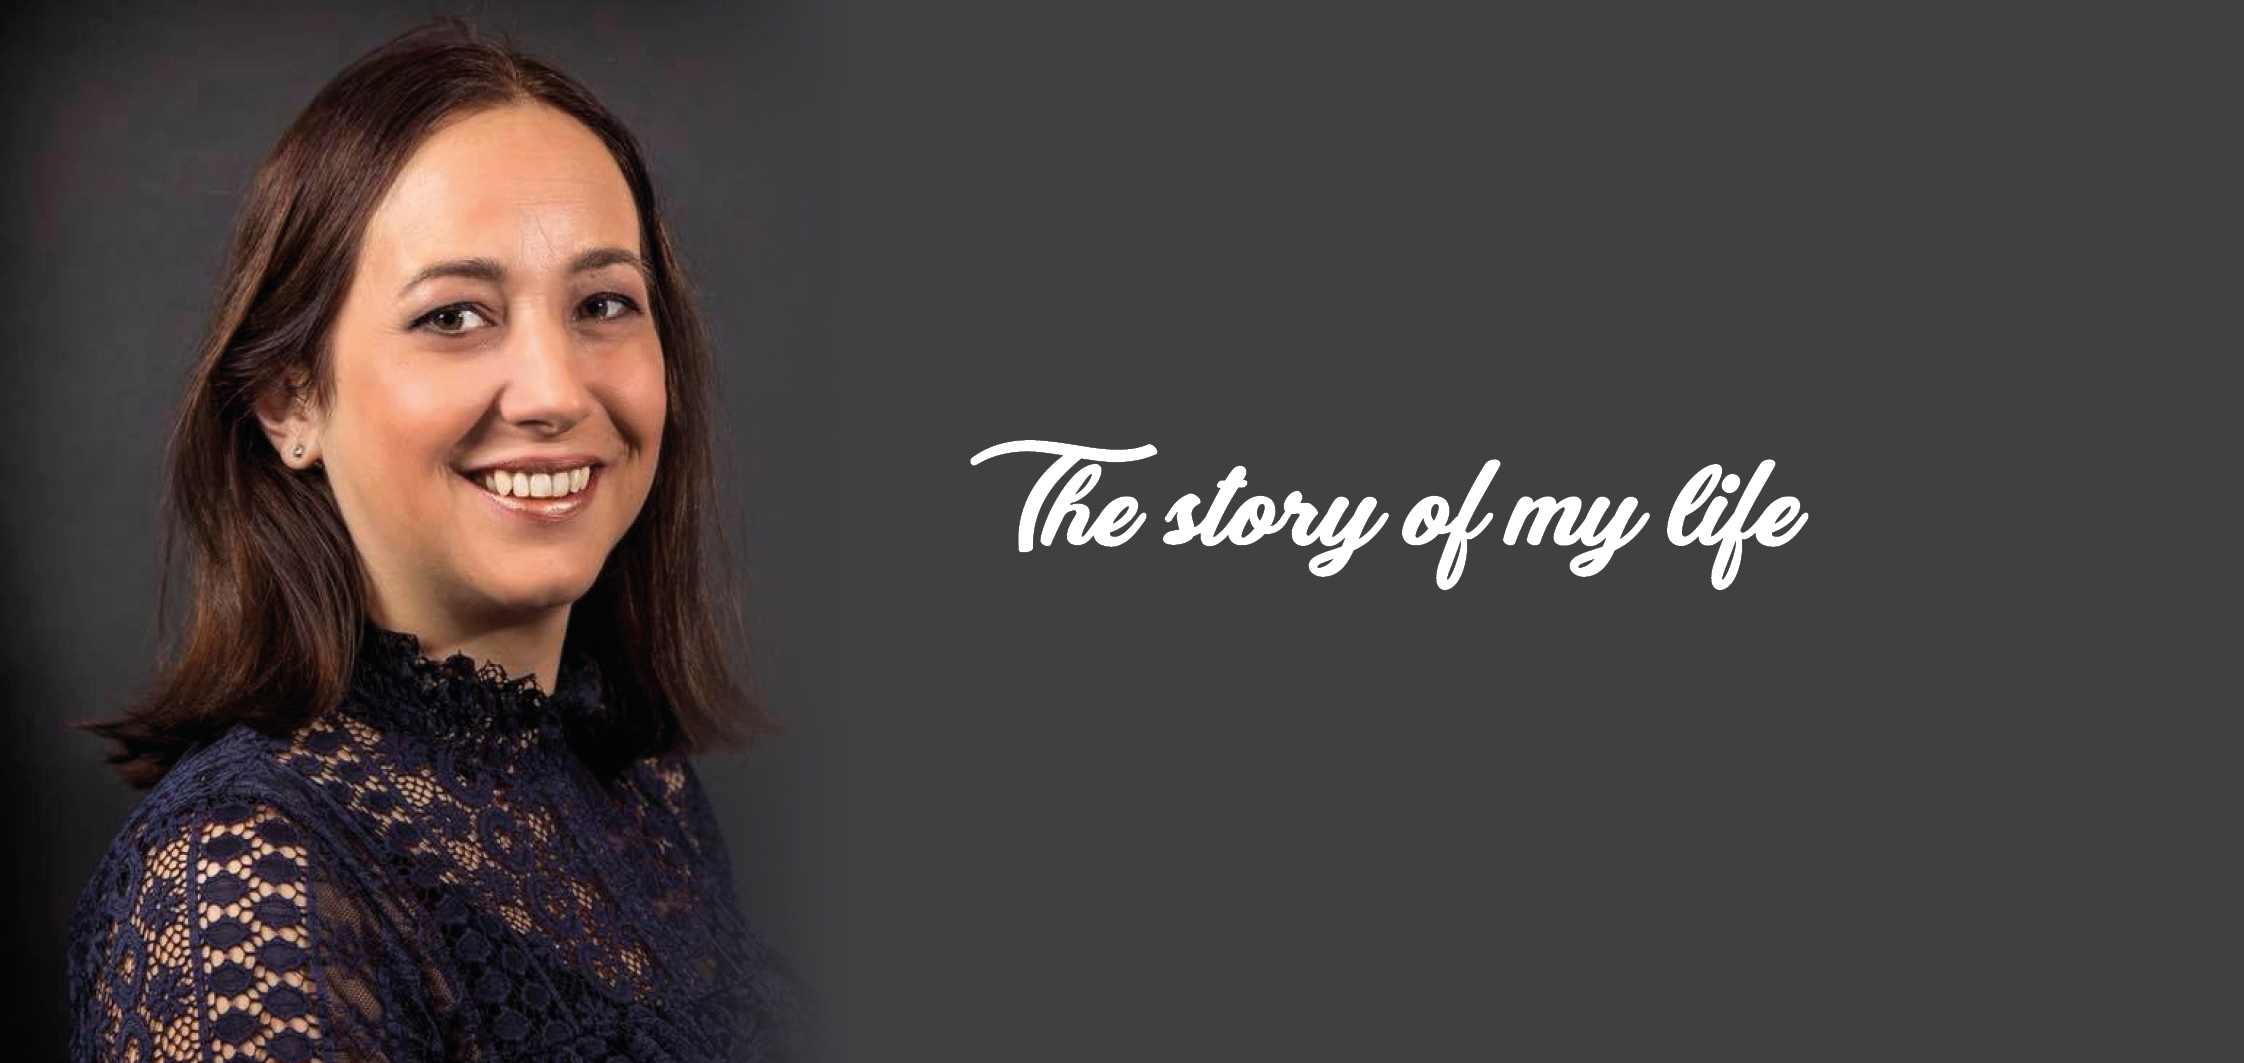 Marjolein Koolen - The story of my life - Look Good Feel Better